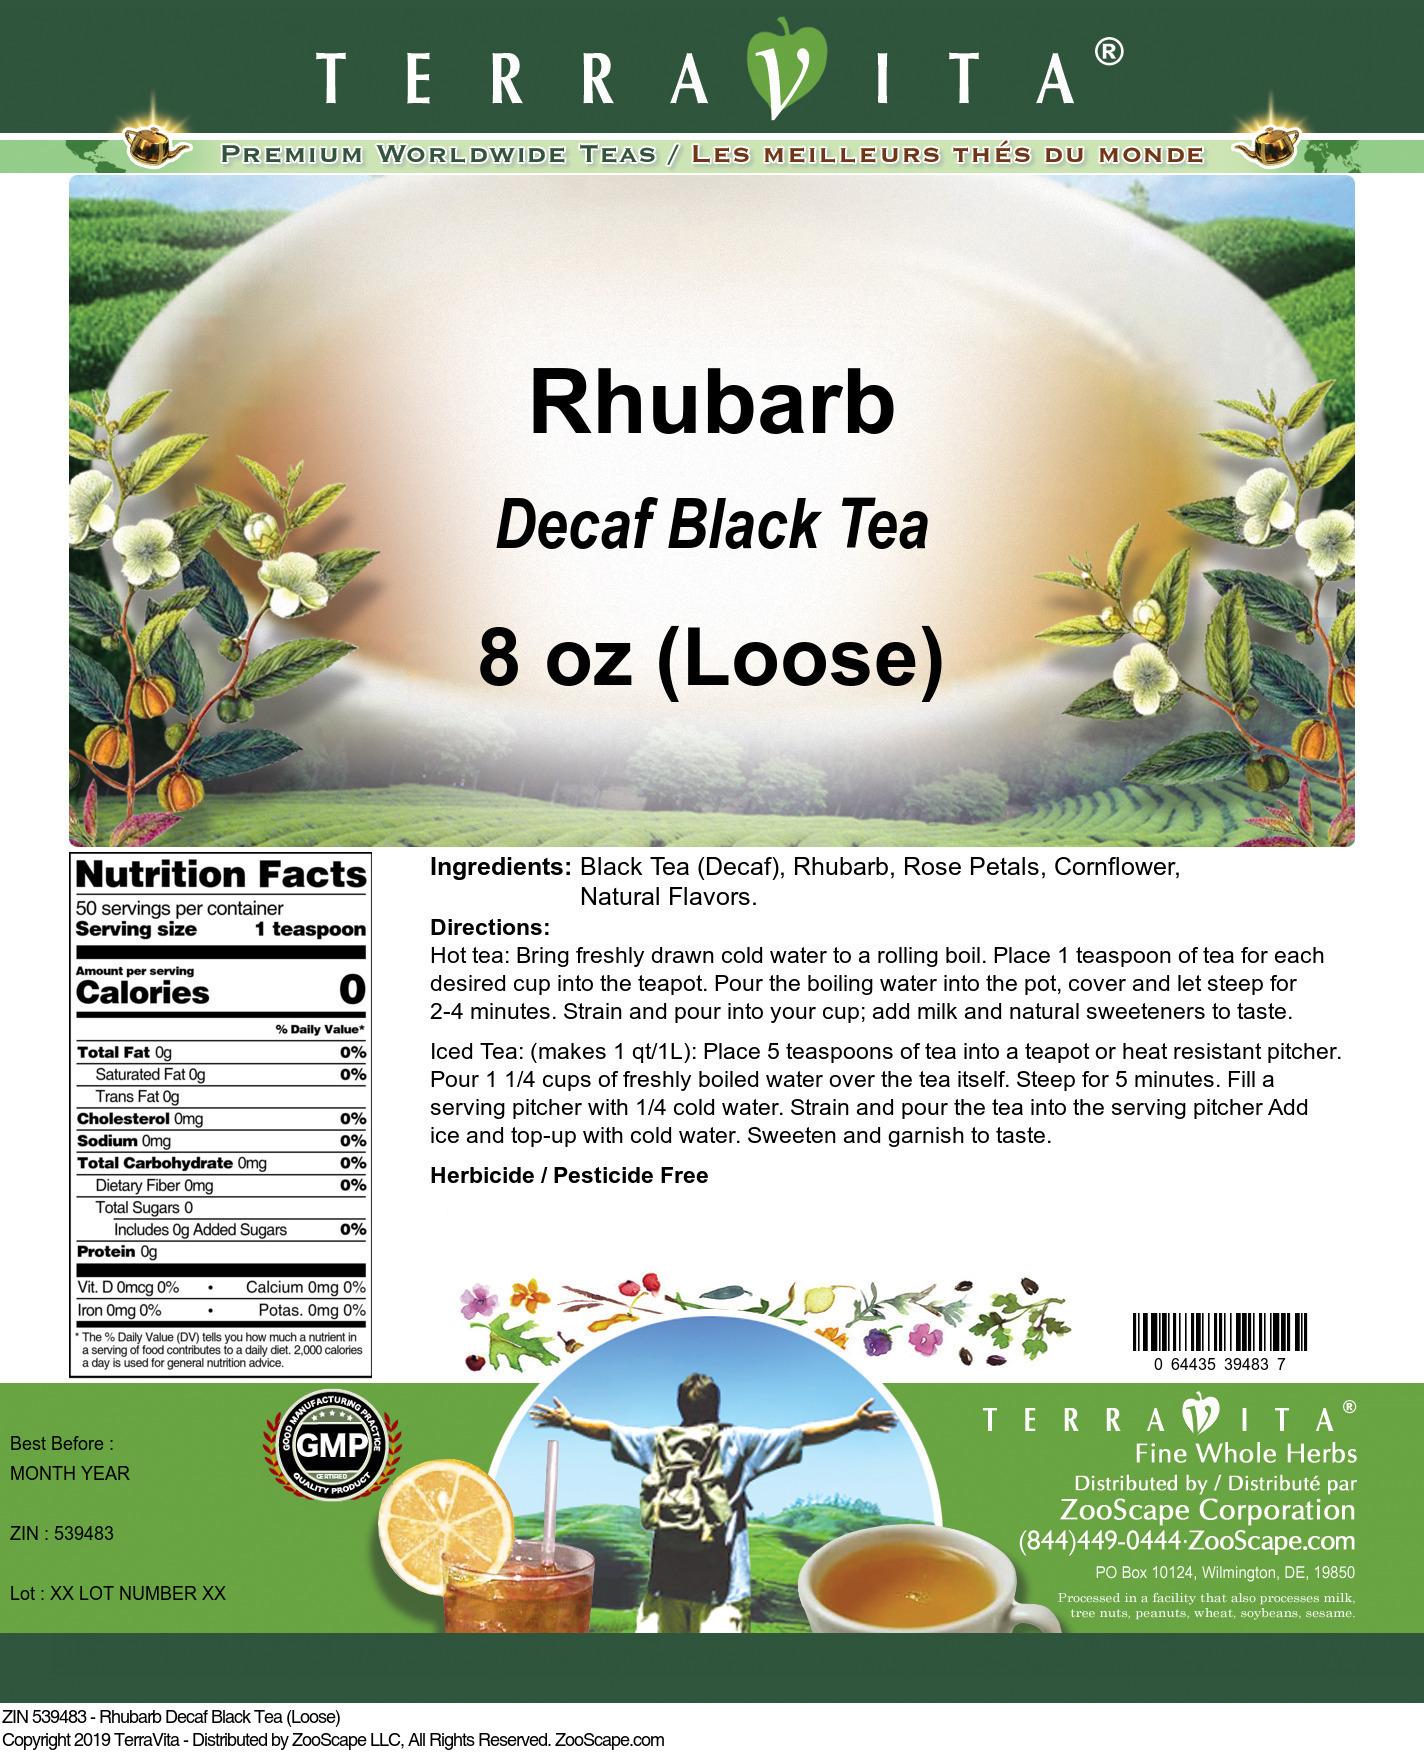 Rhubarb Decaf Black Tea